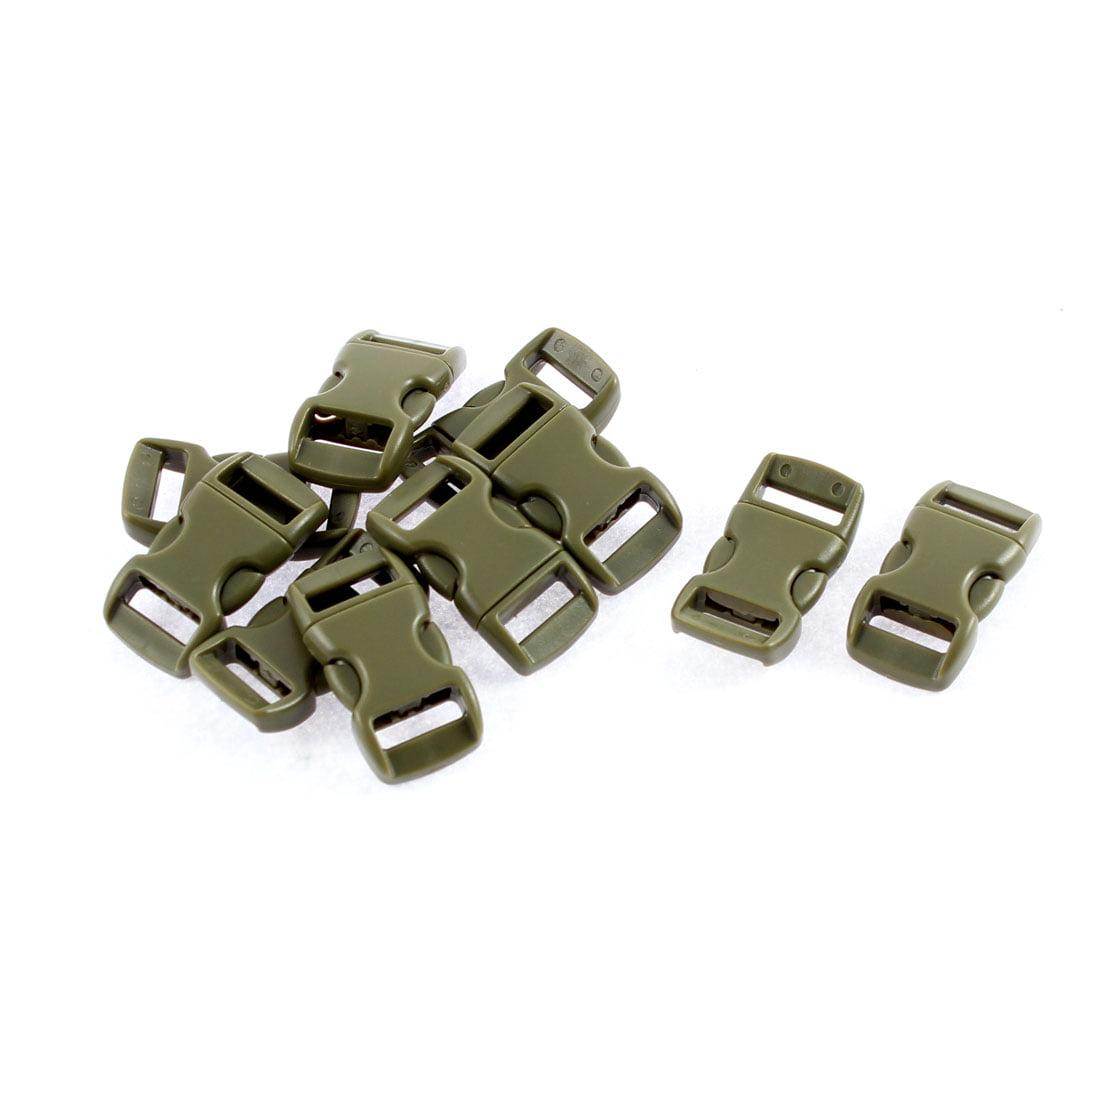 Plastic Quick Side Release Buckles 11mm Webbing Strap 10Pcs